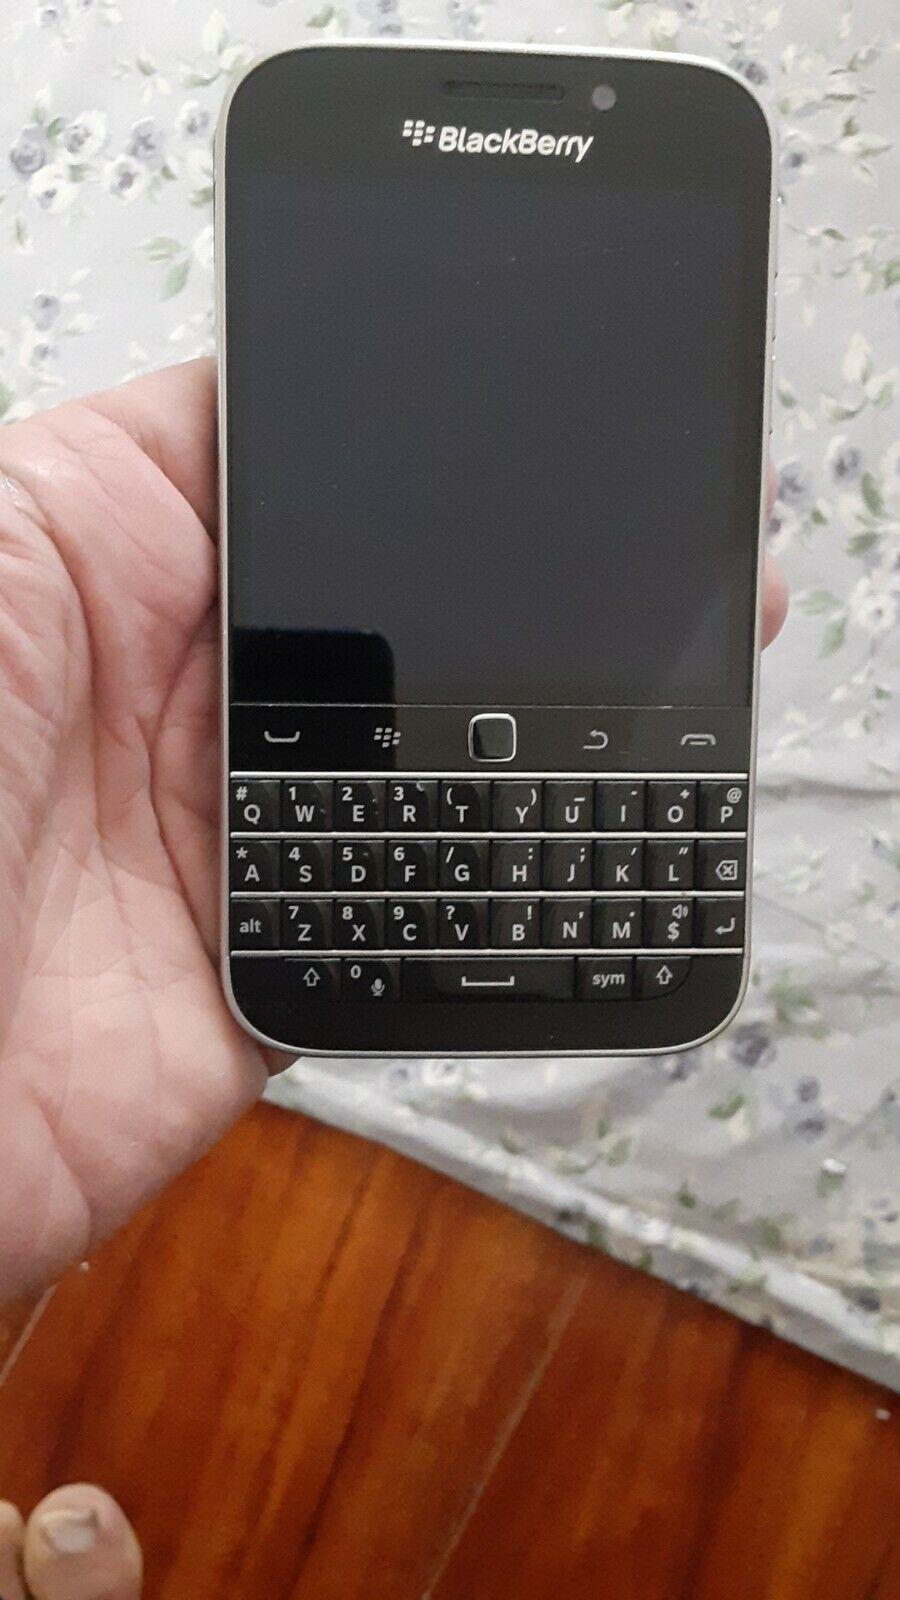 Opera Mini For Blackberry Q10 Opera Mini 7 1 Arrives On Blackberry And Java Phones Download Opera Mini Blackberry Q10 Angelmartinezarmengol